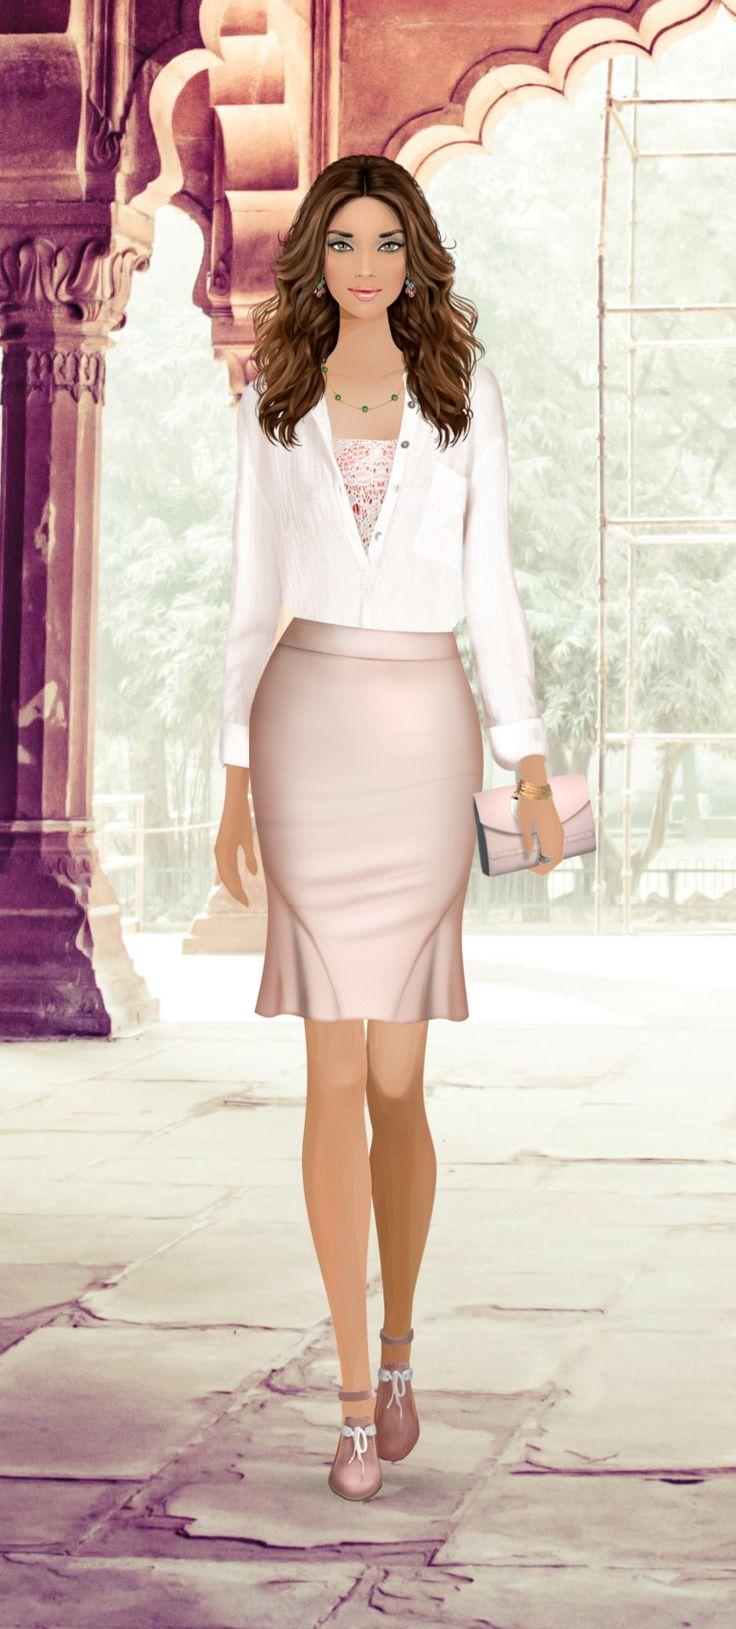 Stunning Sandal event on Covet Fashion Game